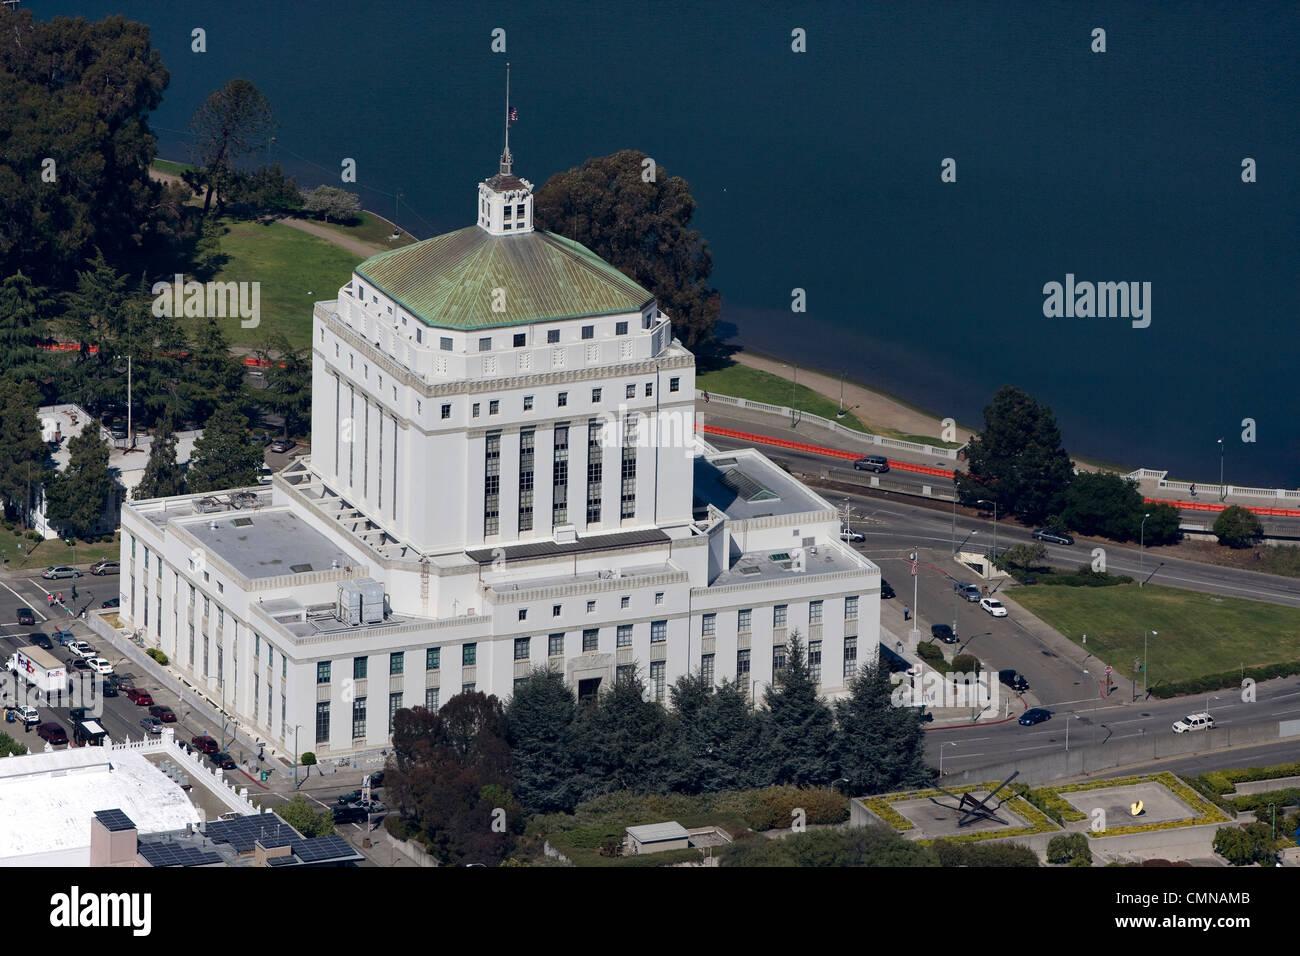 aerial photograph Alameda courthouse Oakland, California - Stock Image